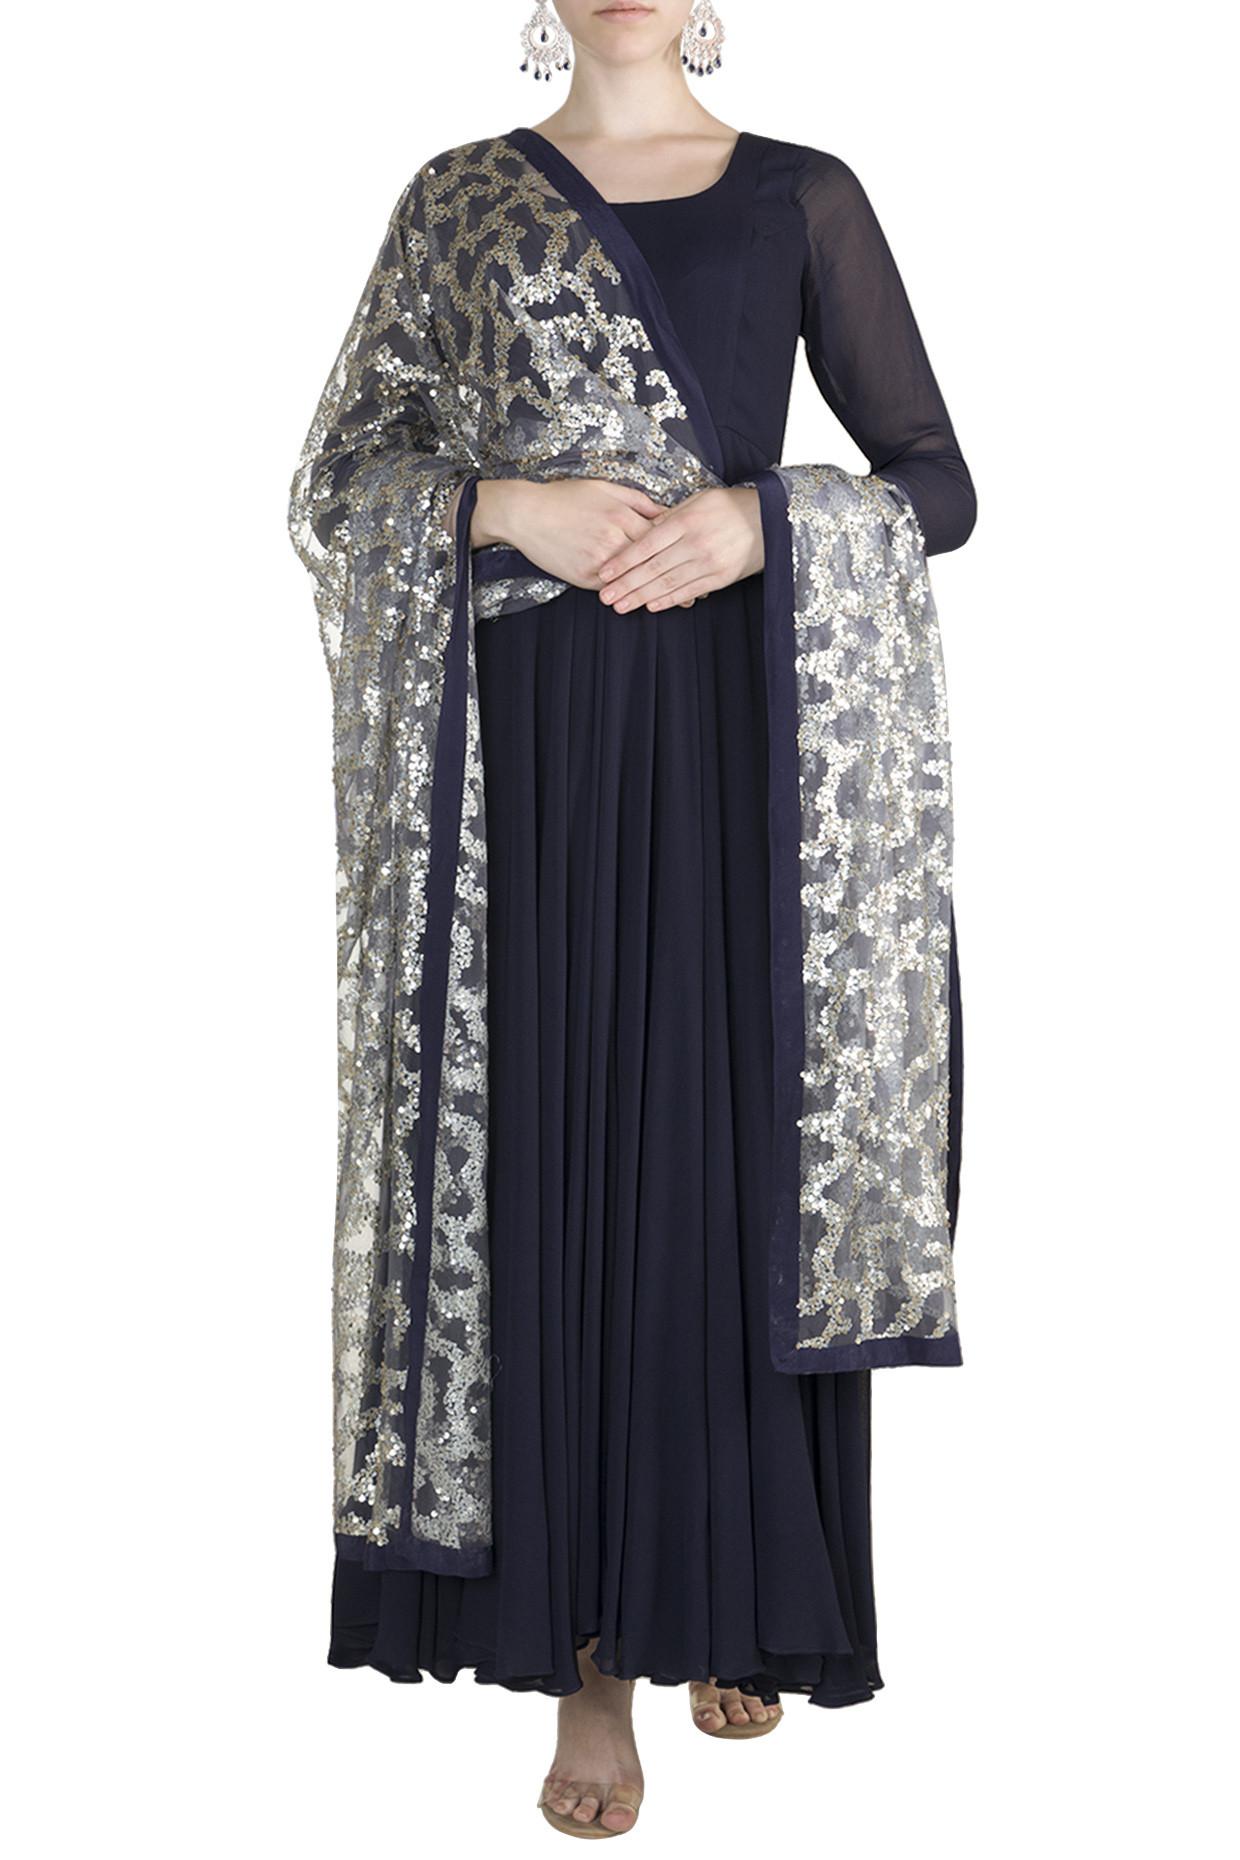 Midnight Blue Anarkali With Embellished Dupatta by Rishi & Vibhuti